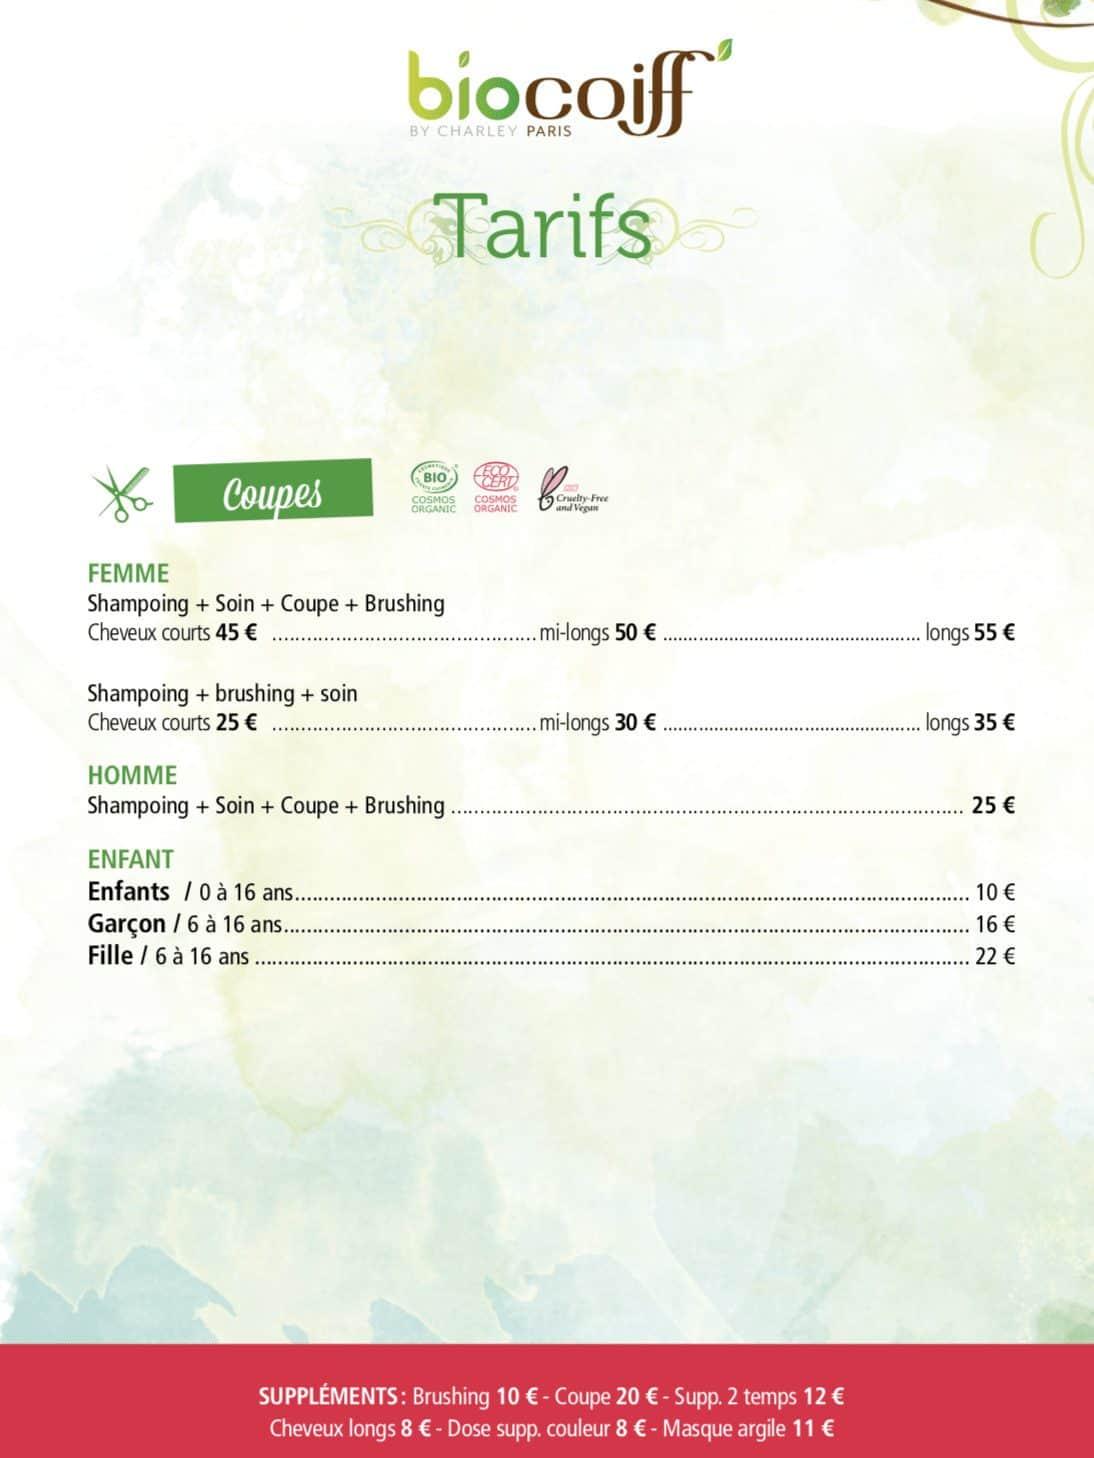 biocoiff tarifs frejus 2